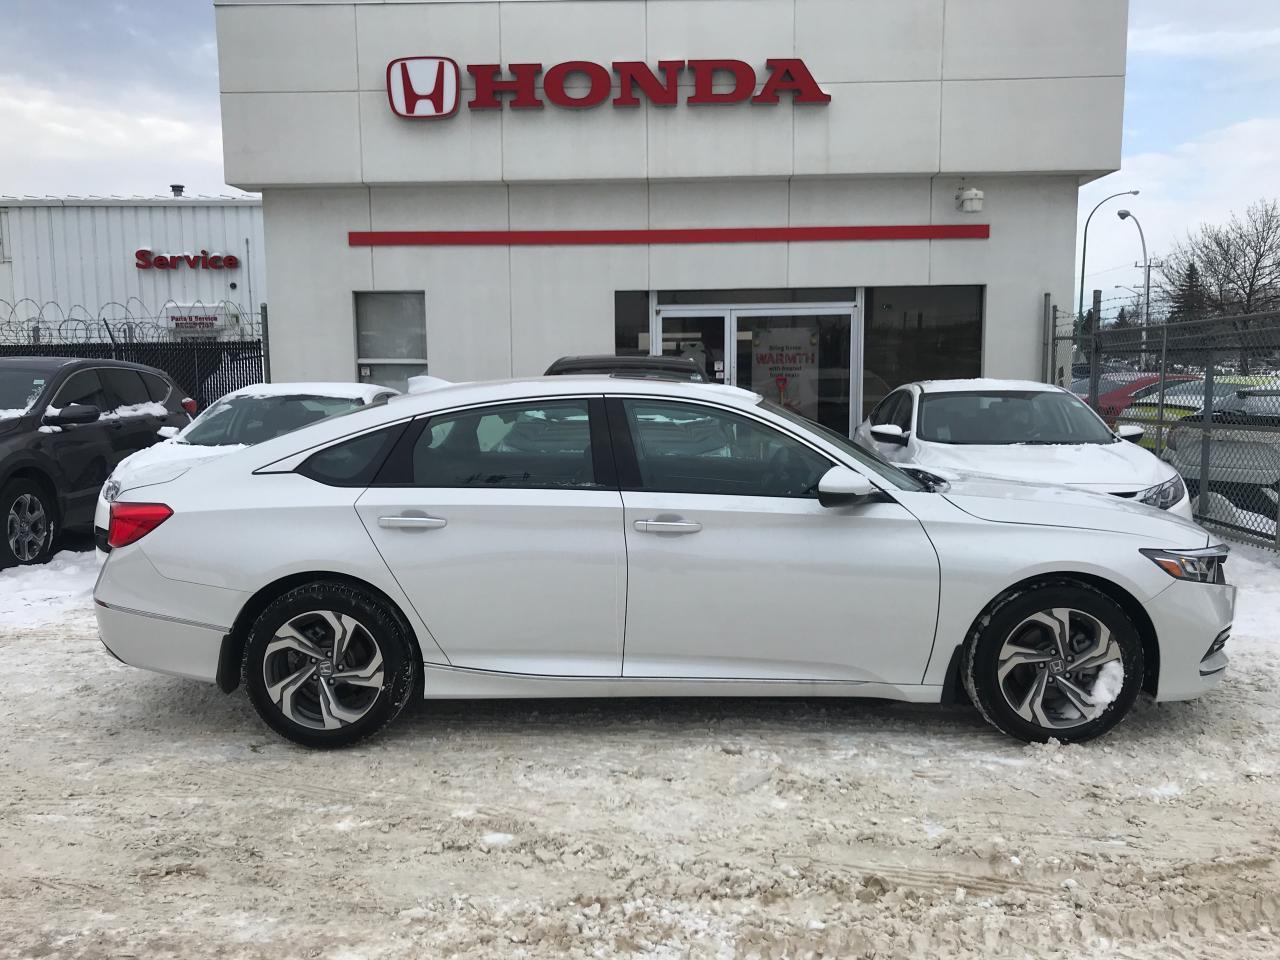 2018 Honda Accord EX-L Leather Like New